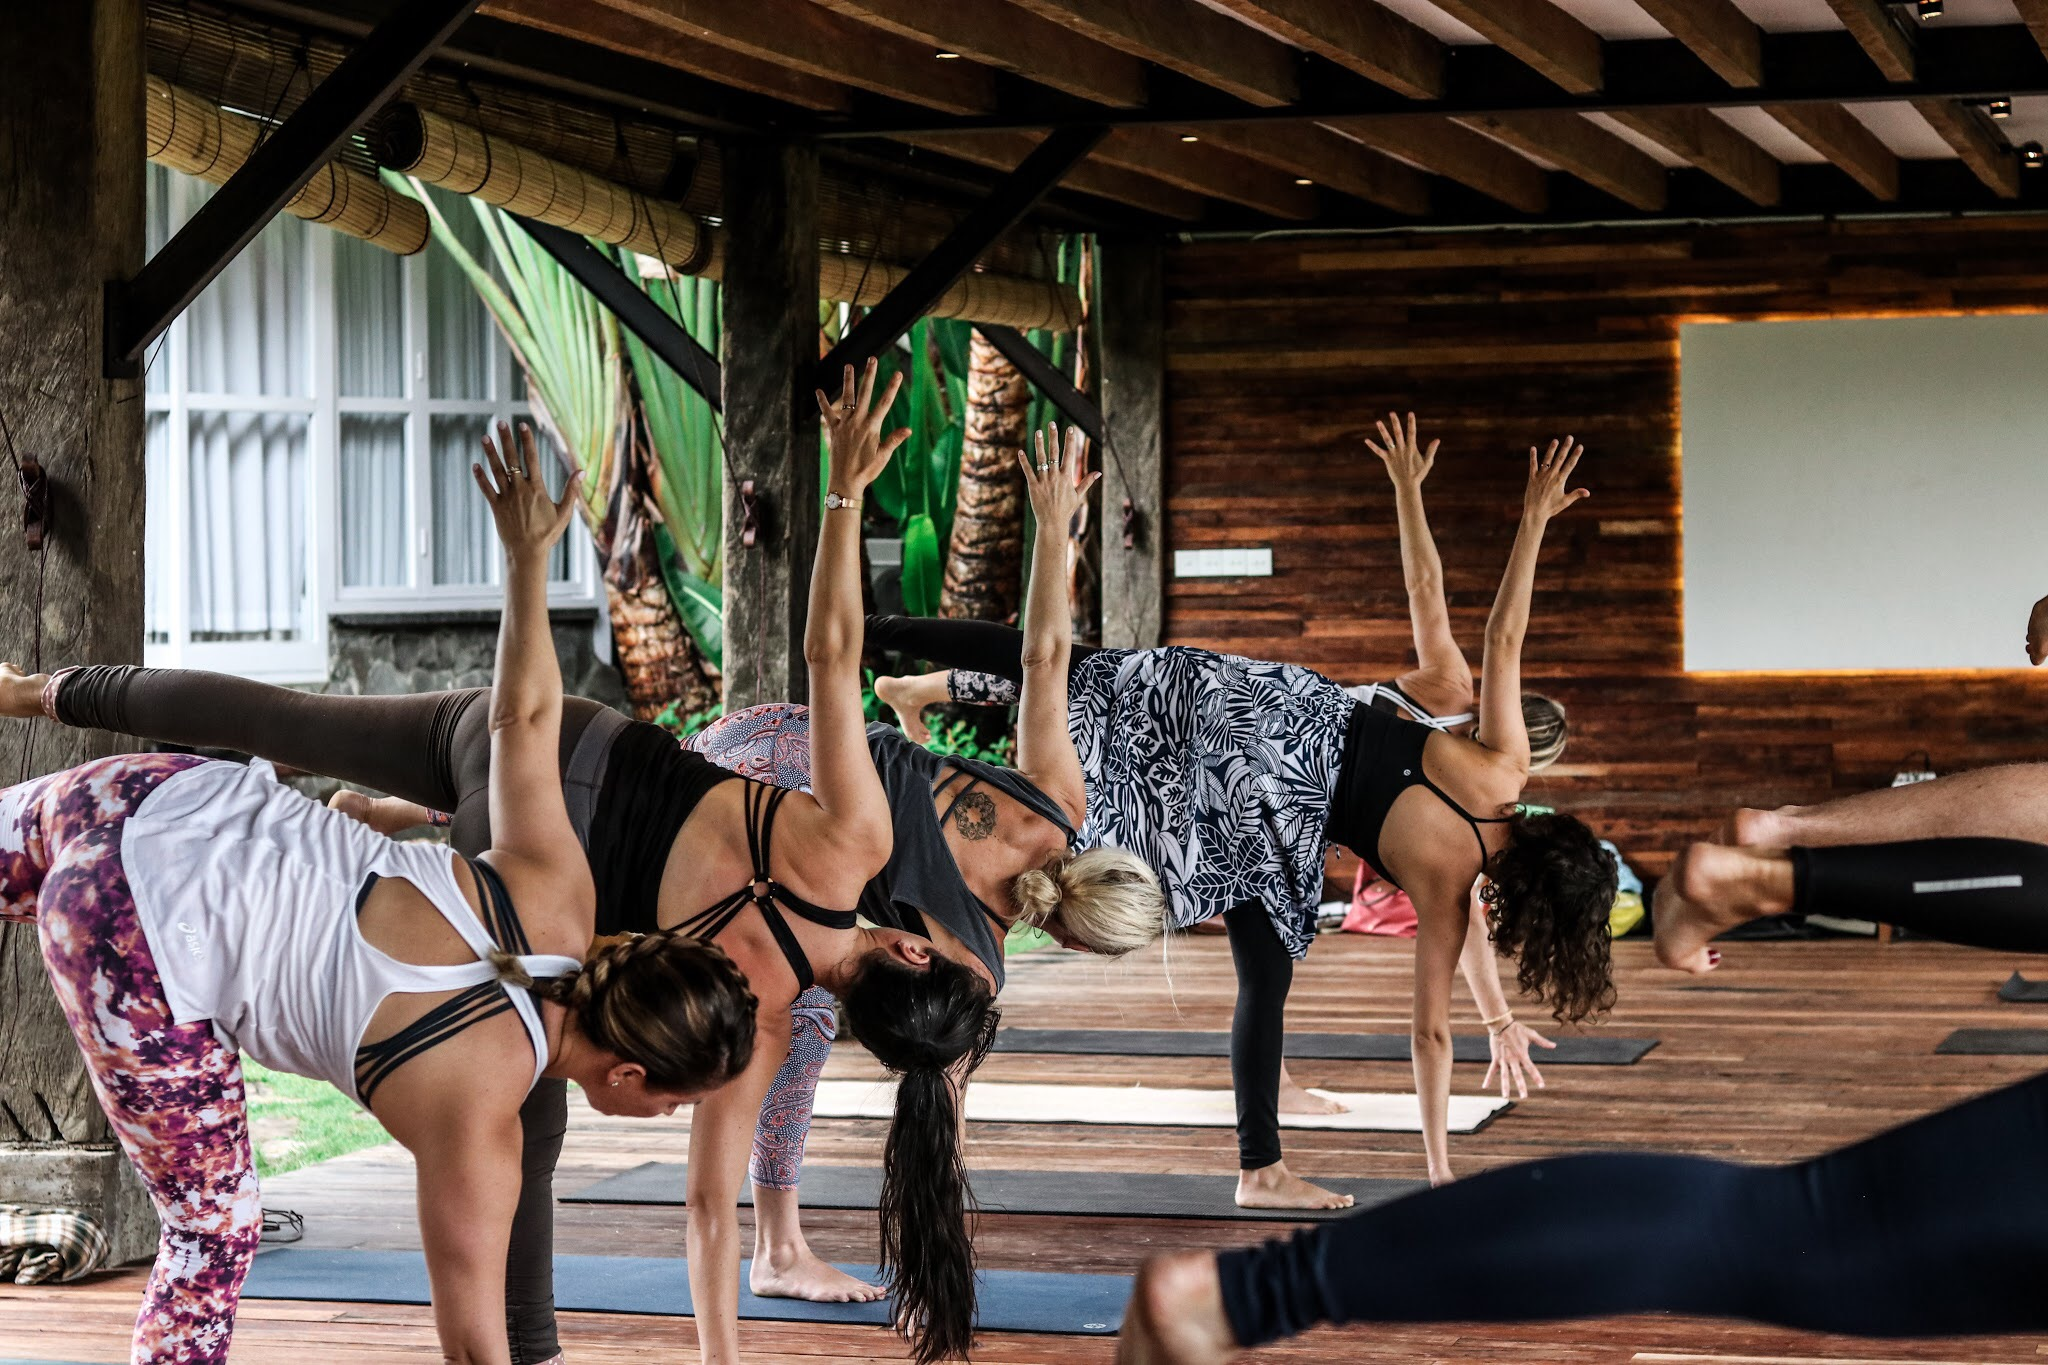 2652C41C-2A34-44C0-9ADD-42FA447334A4 - Rise Yoga.jpeg